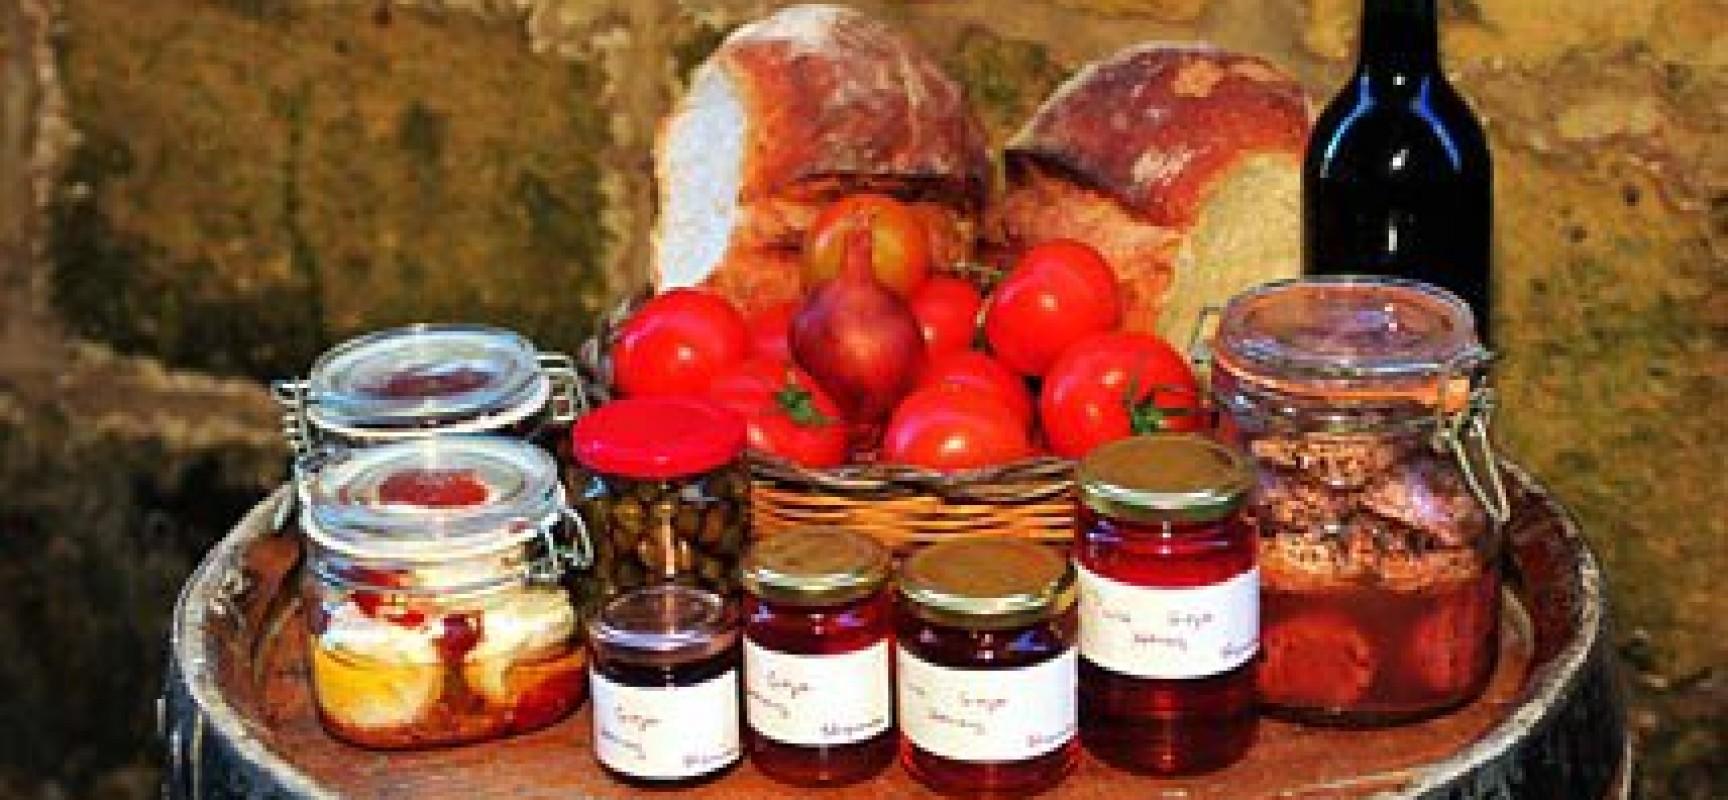 Maltese Cuisine – The Streets